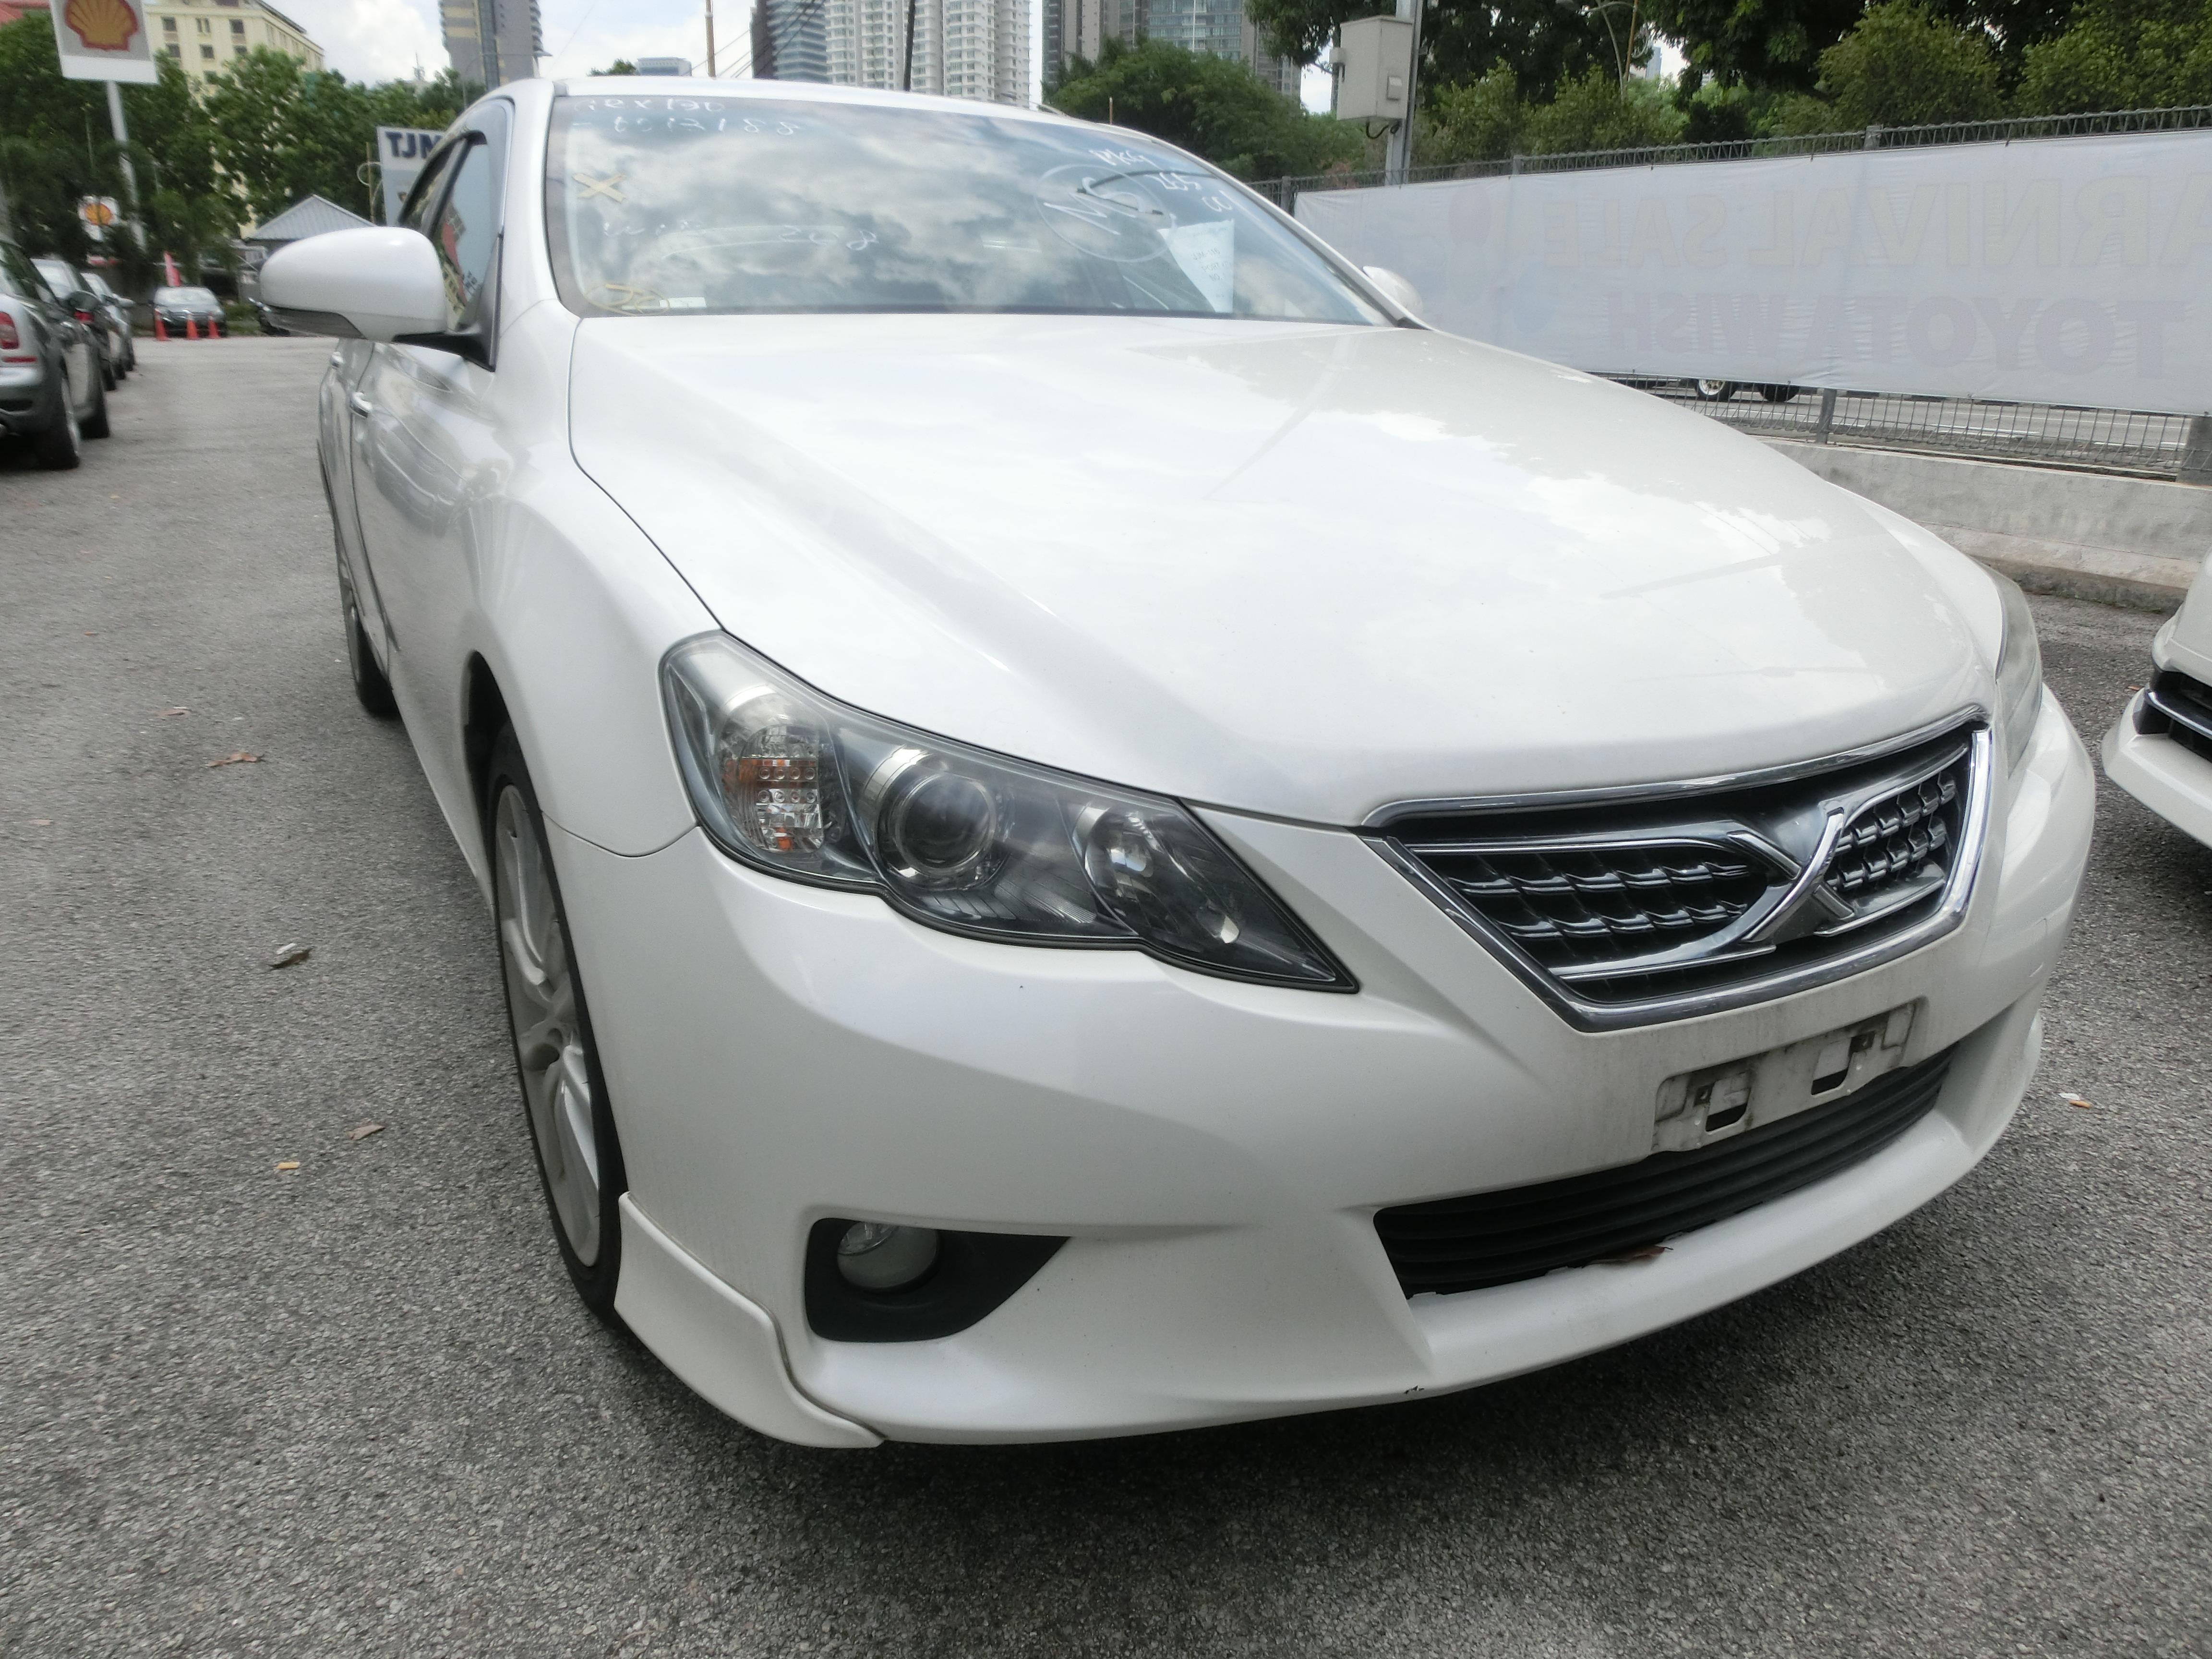 2012 Toyota MarkX 1.8 Toyota, Cars for sale, Car